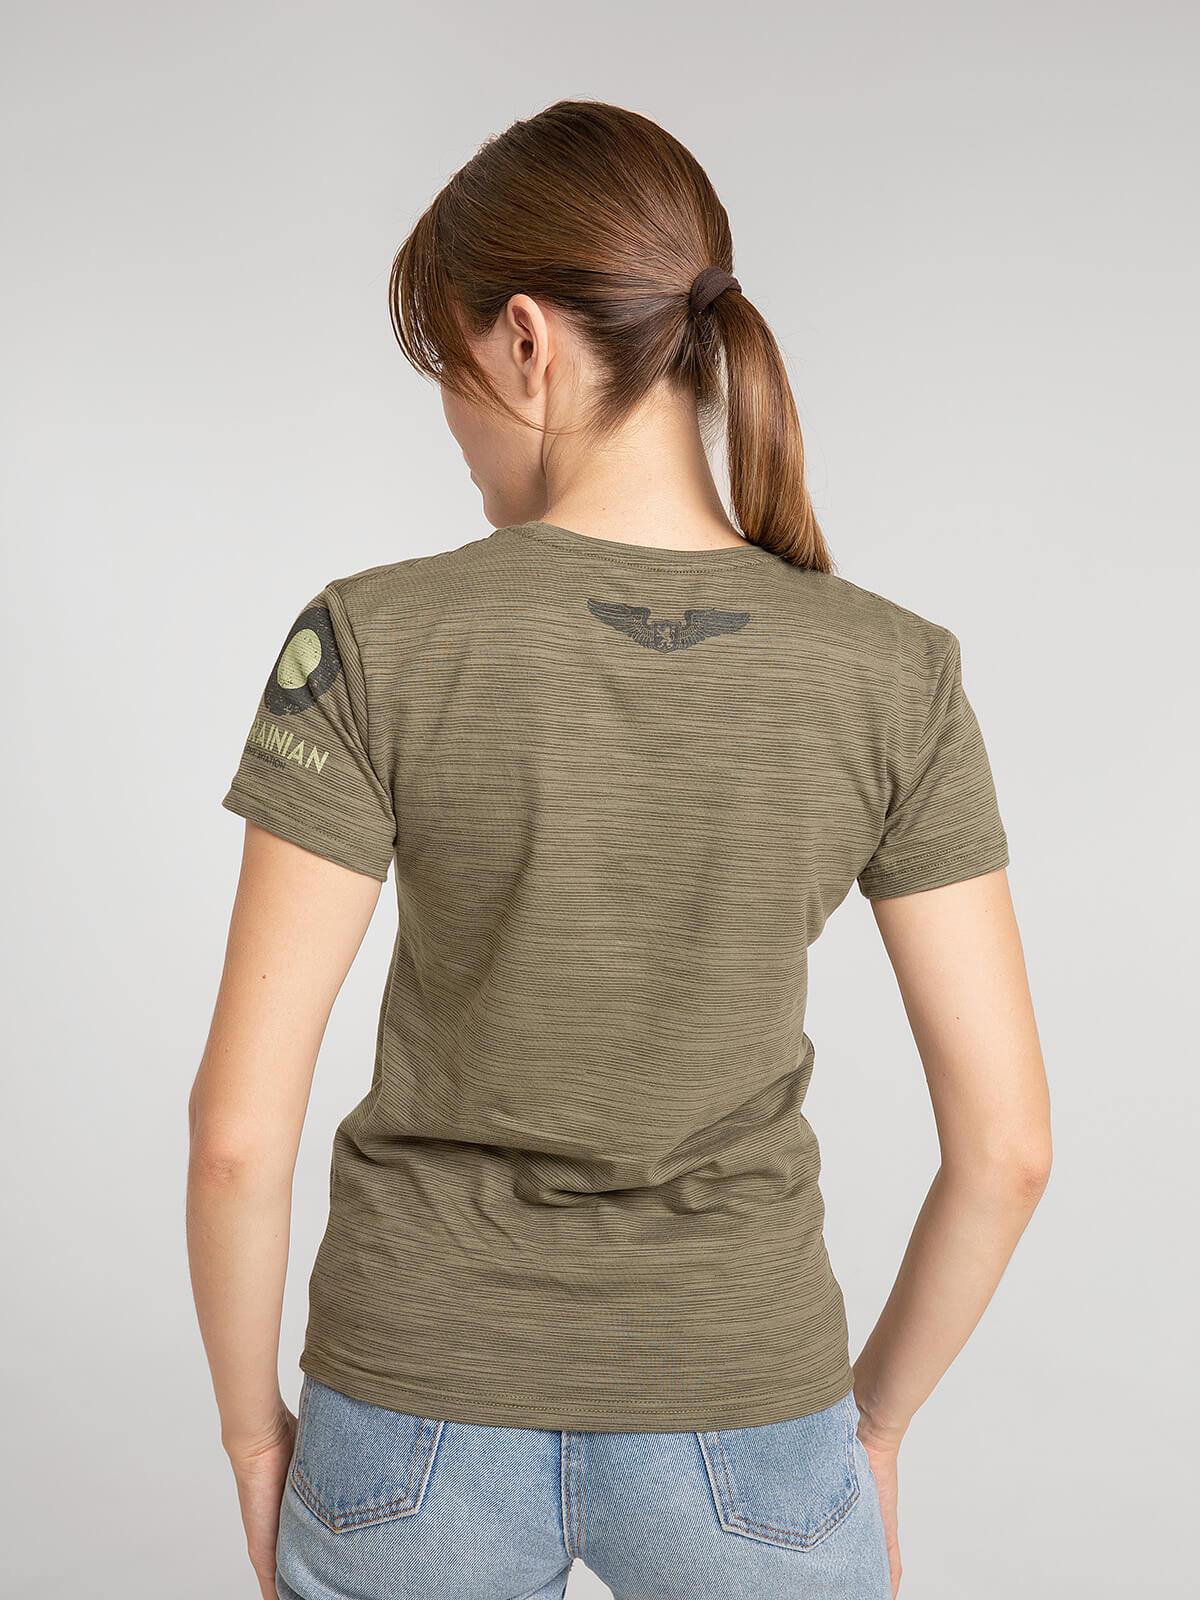 Women's T-Shirt 16 Brigade. Color khaki.  Technique of prints applied: silkscreen printing.